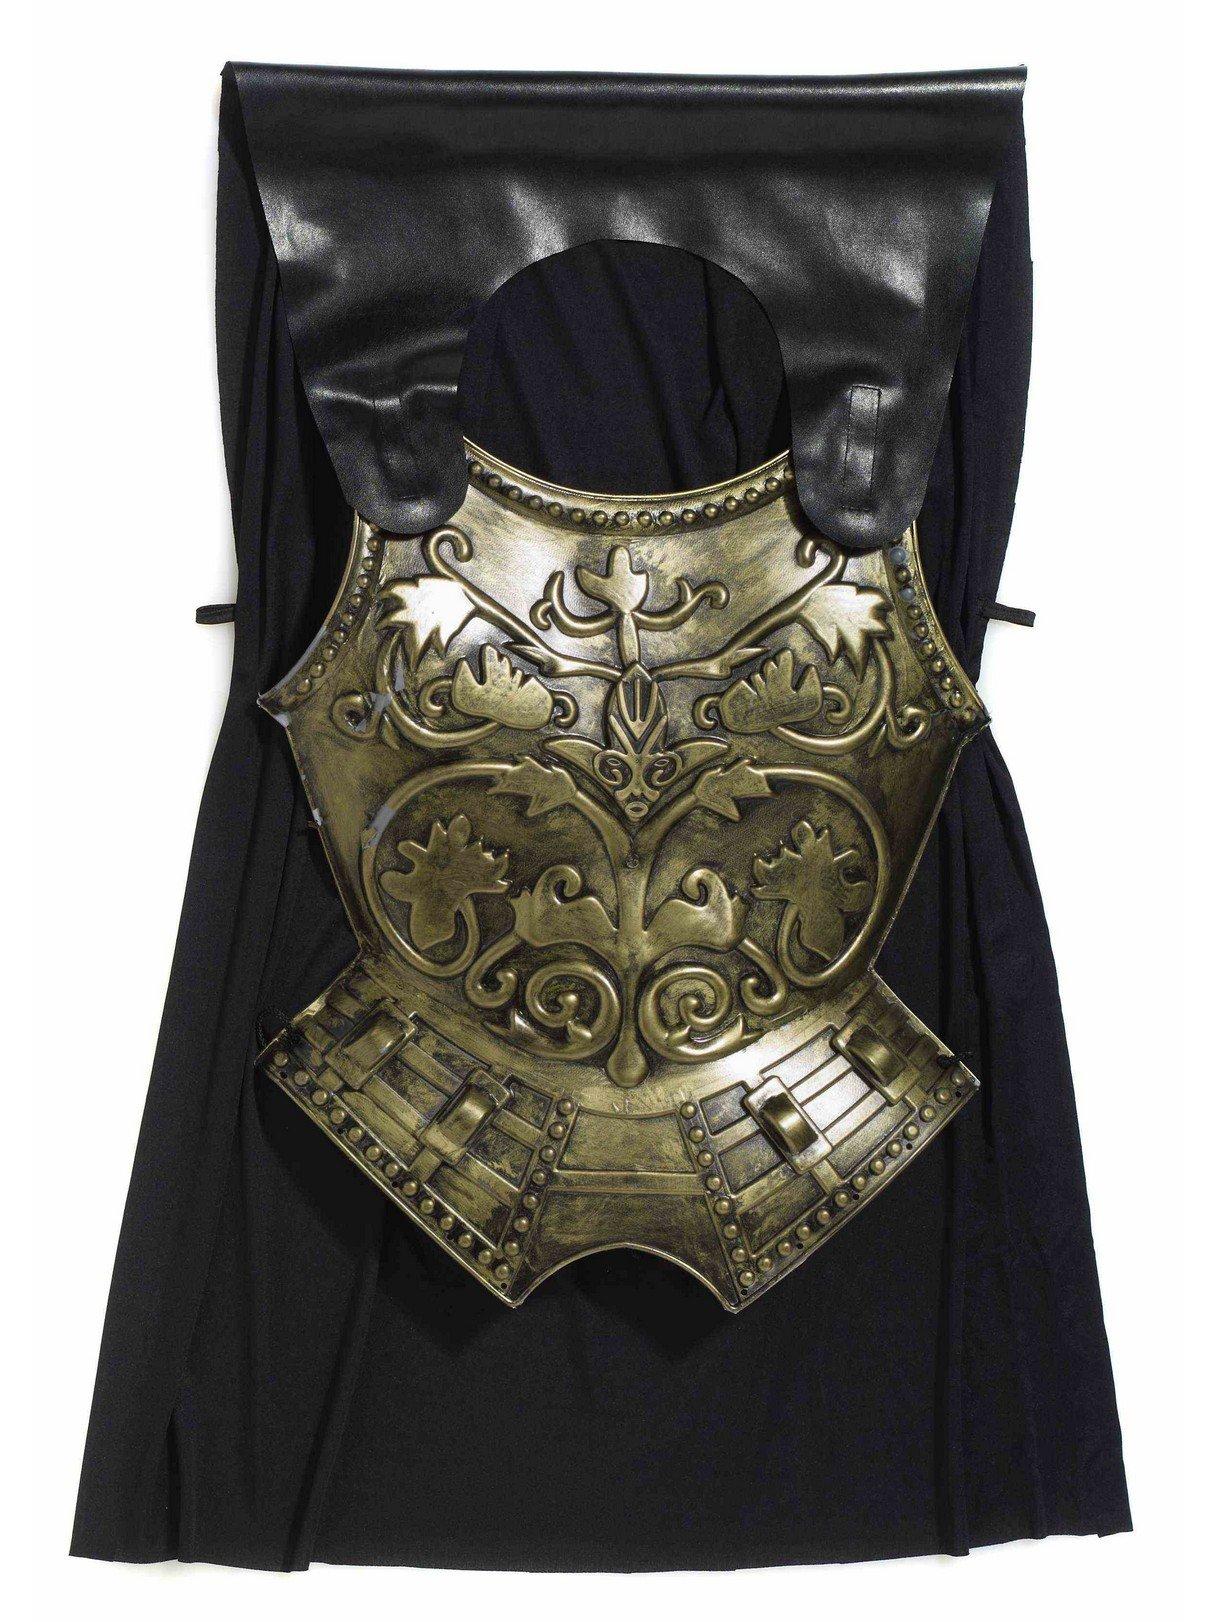 Forum Novelties Roman Costume Chest Armor with Cape, Bronze, One Size